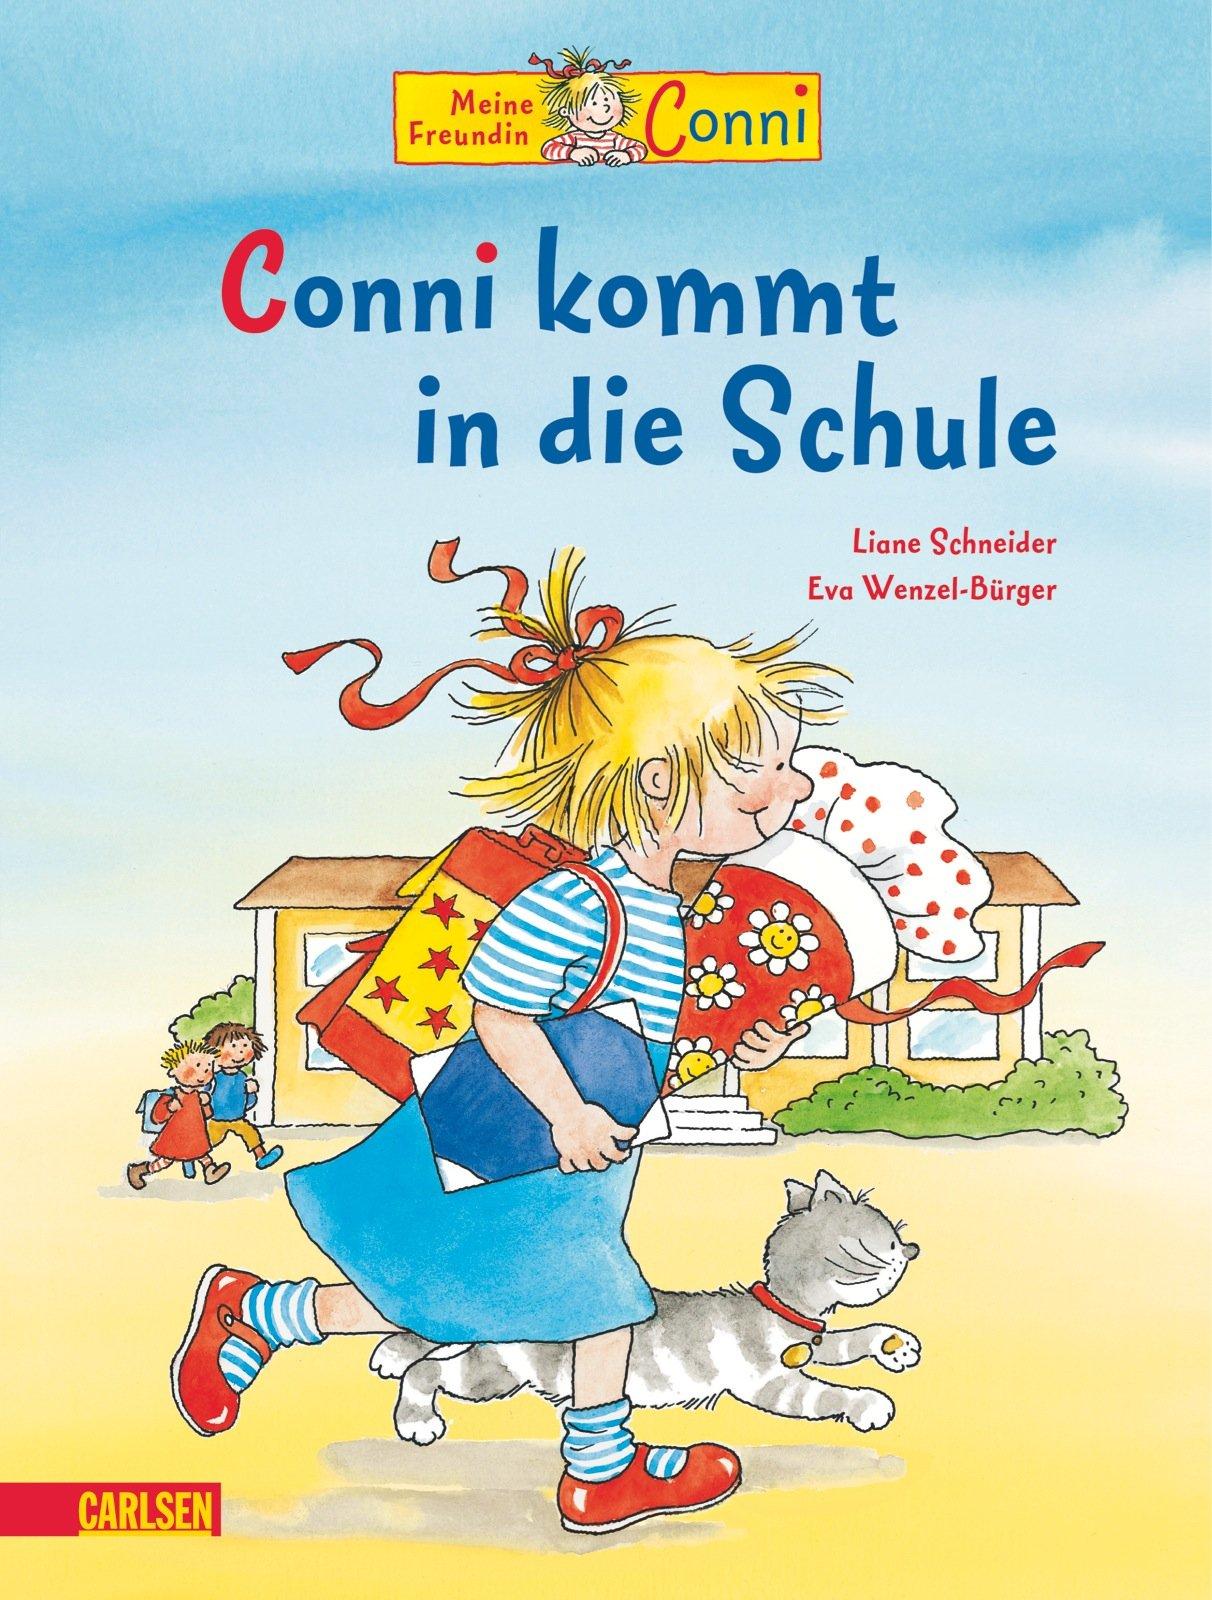 conni-bilderbcher-conni-kommt-in-die-schule